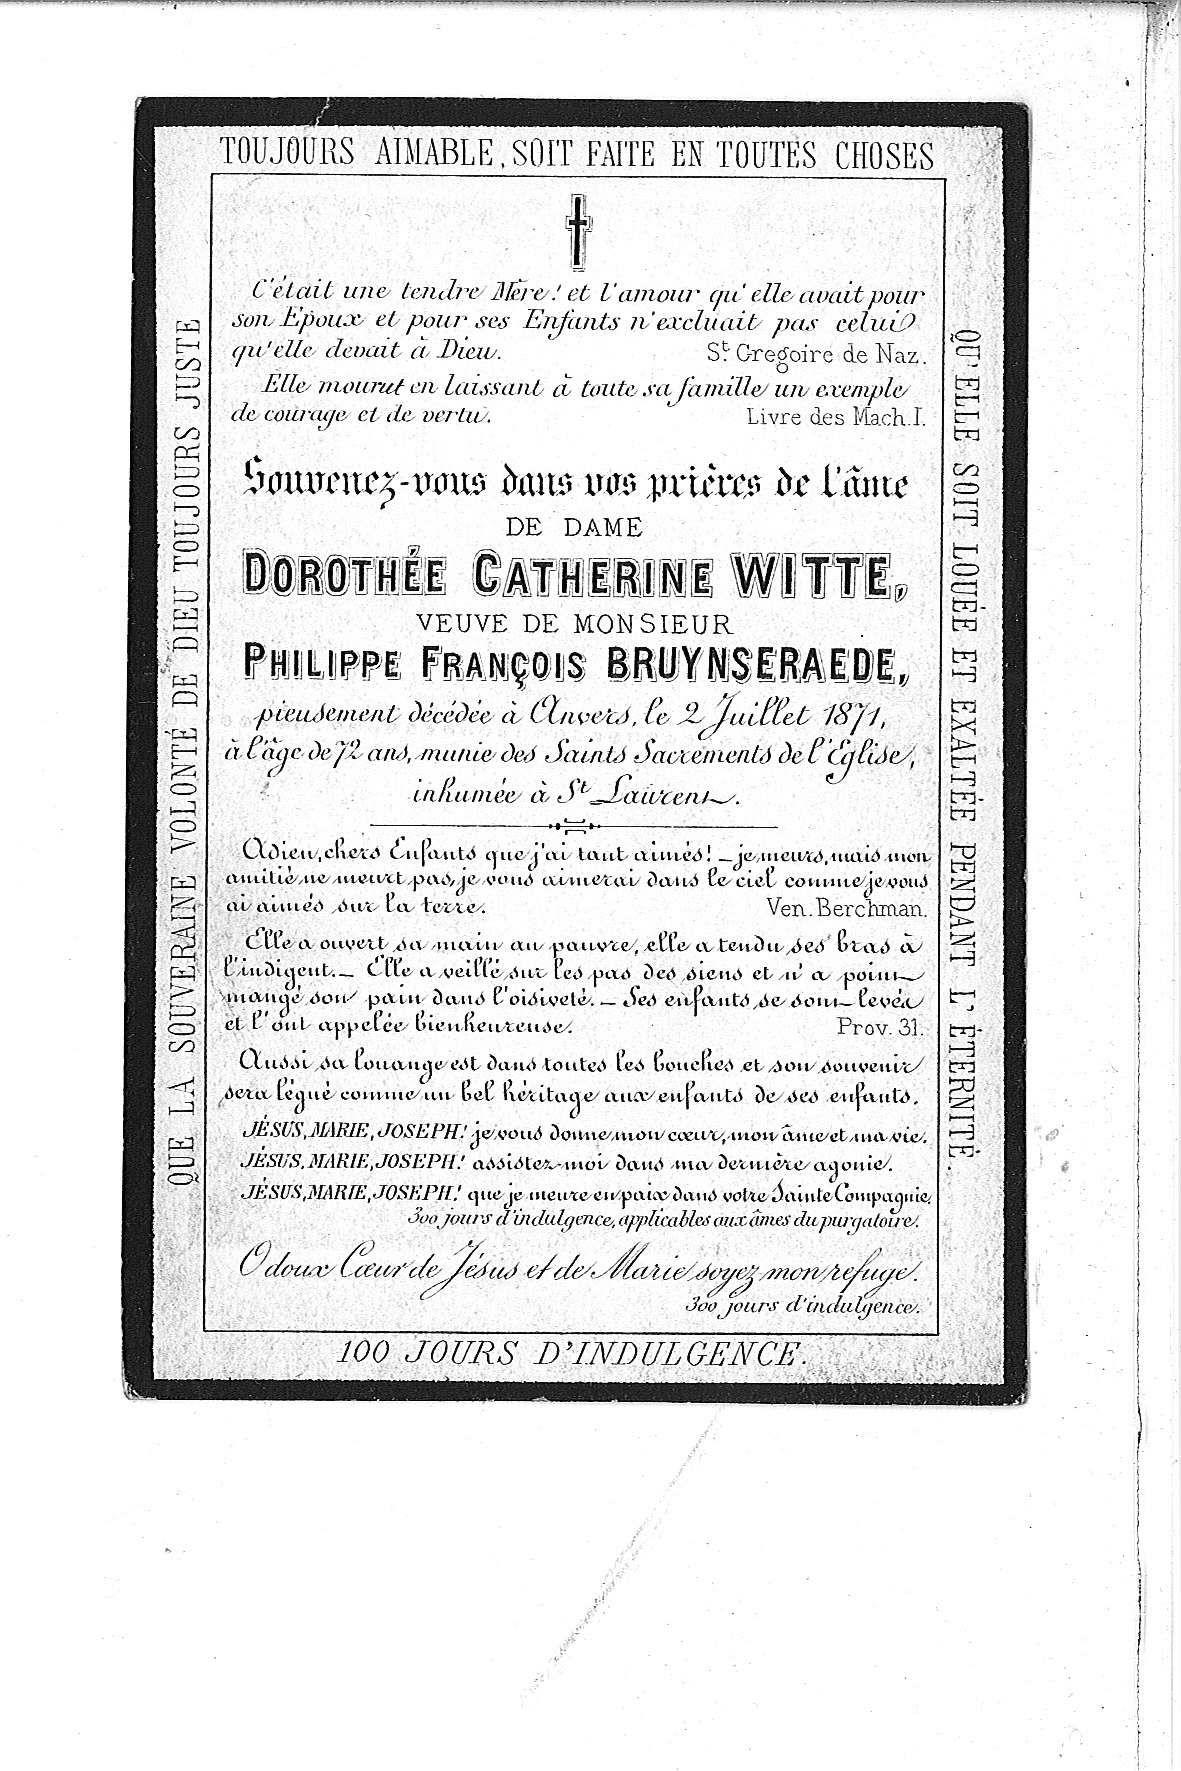 Dorothée-Catherine(1871)20100813092131_00028.jpg